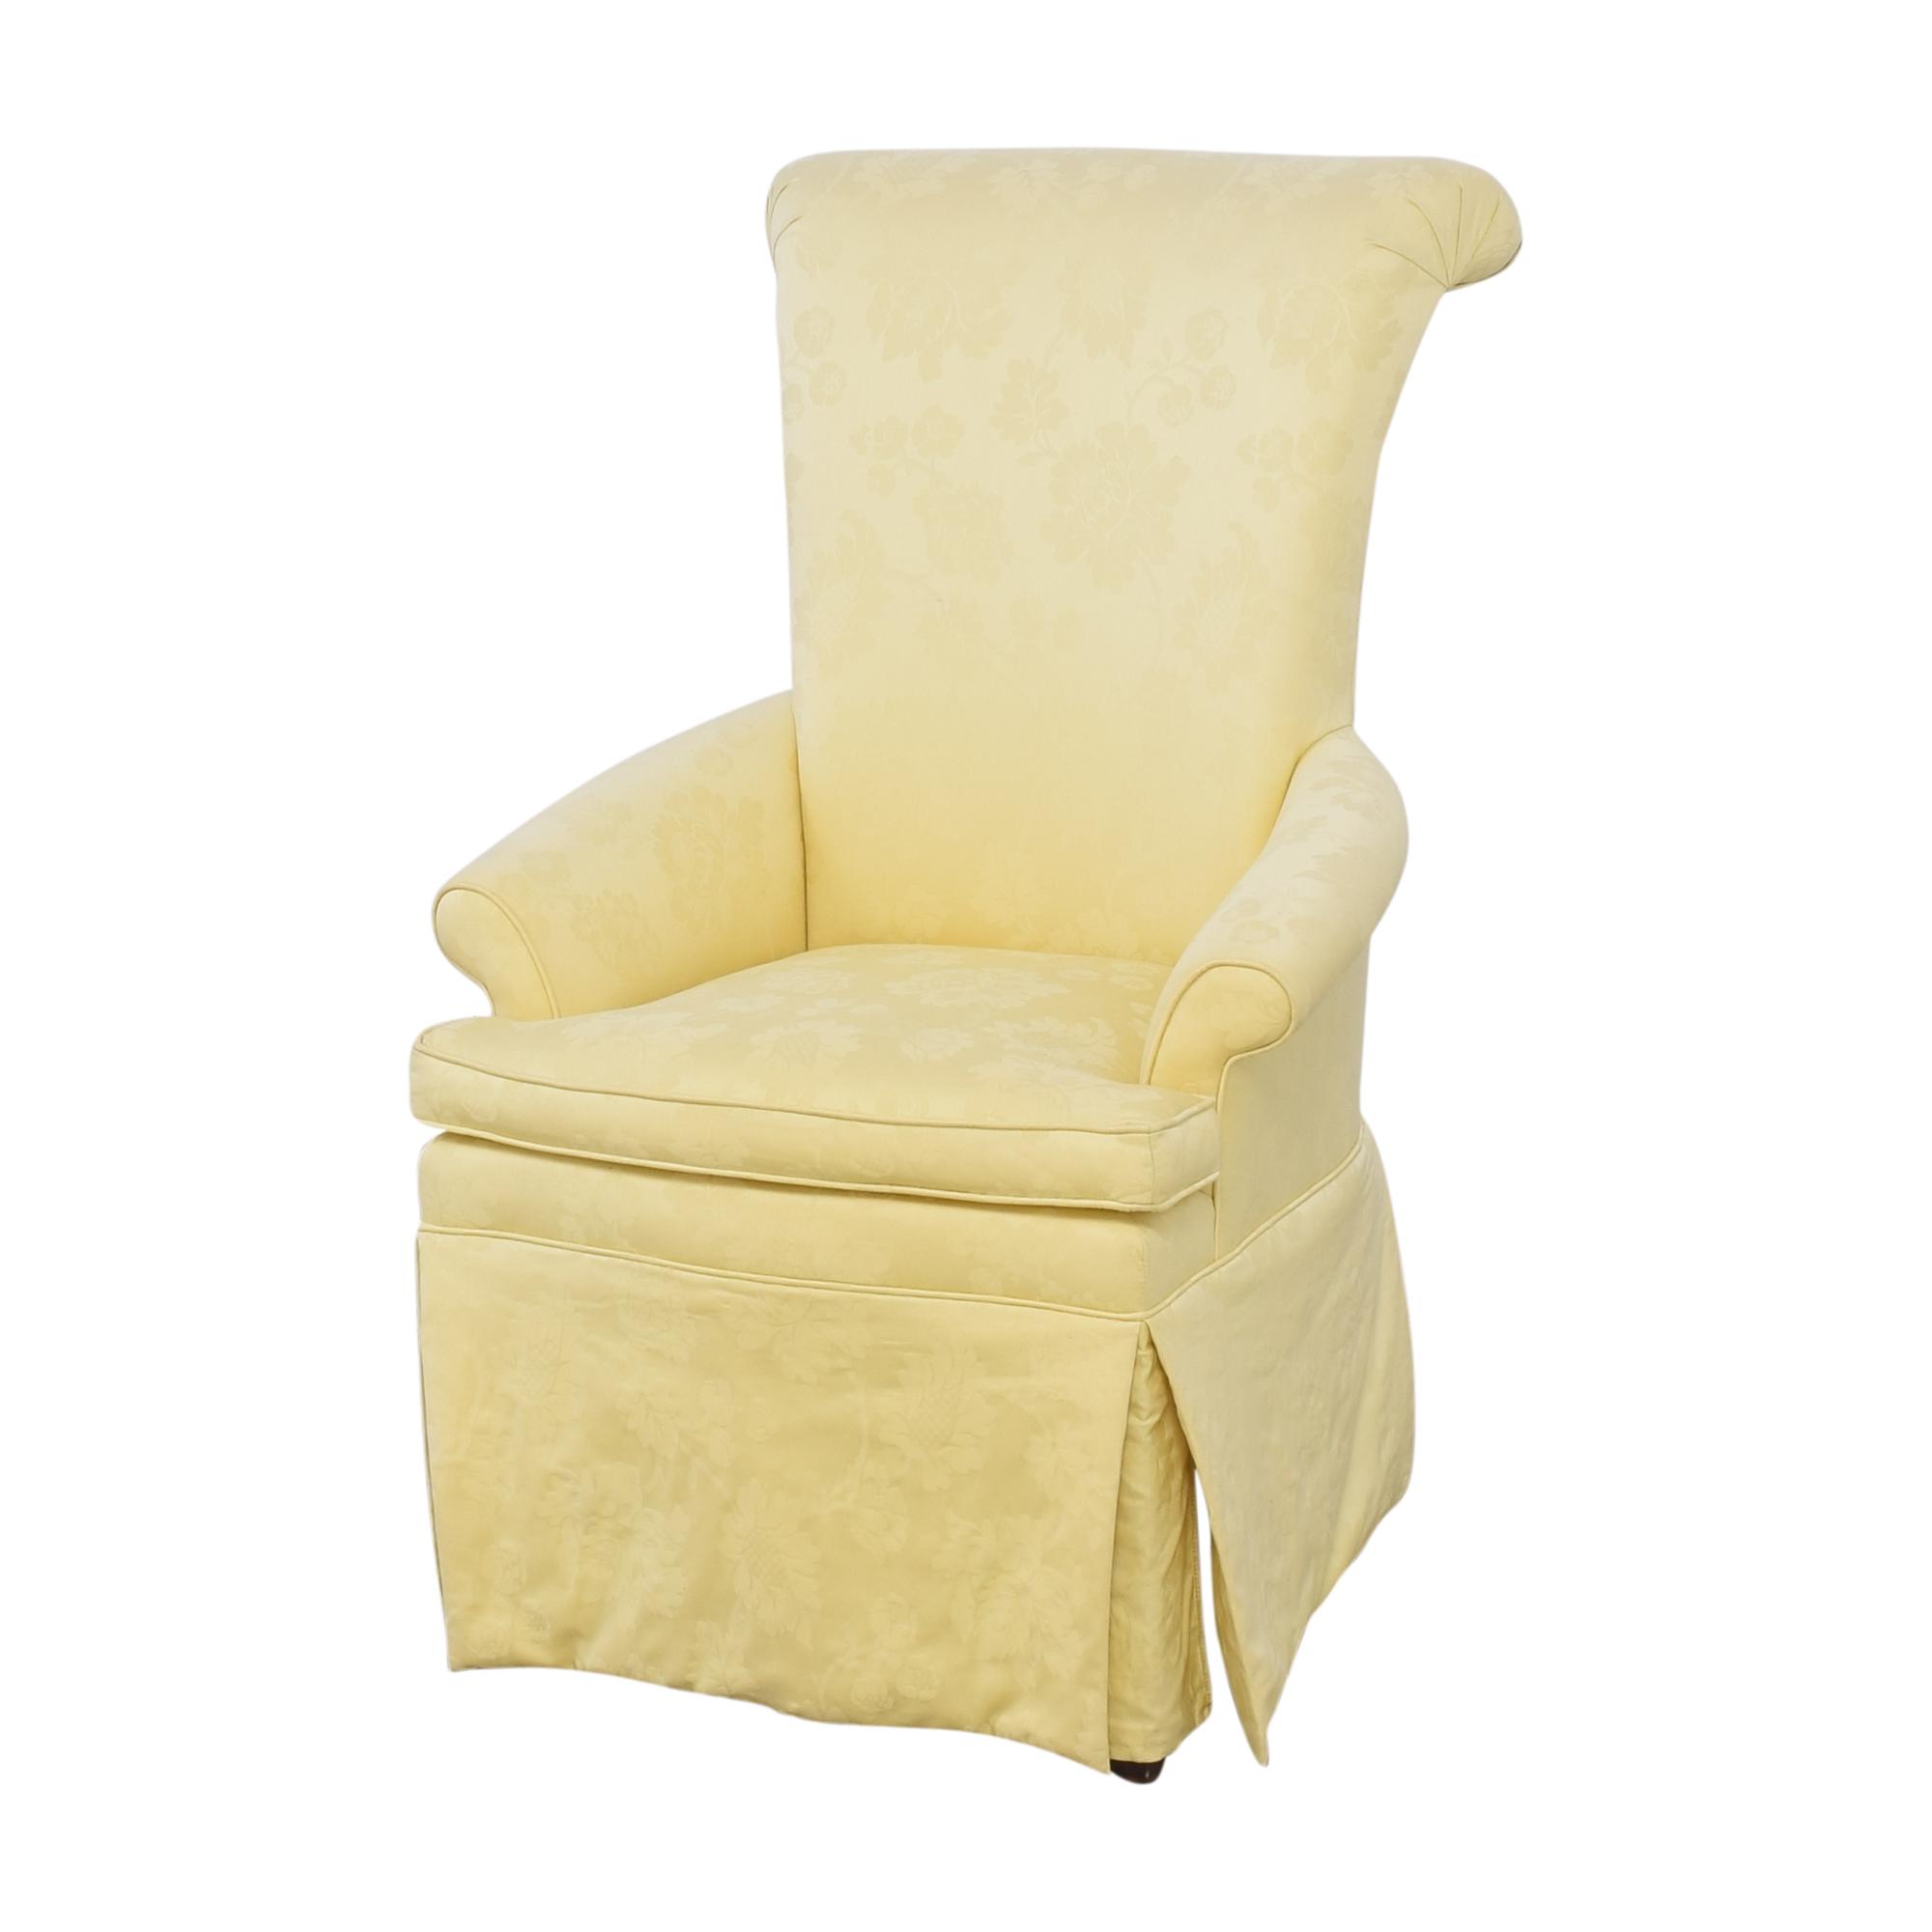 Ethan Allen Ethan Allen Skirted Host Chair dimensions